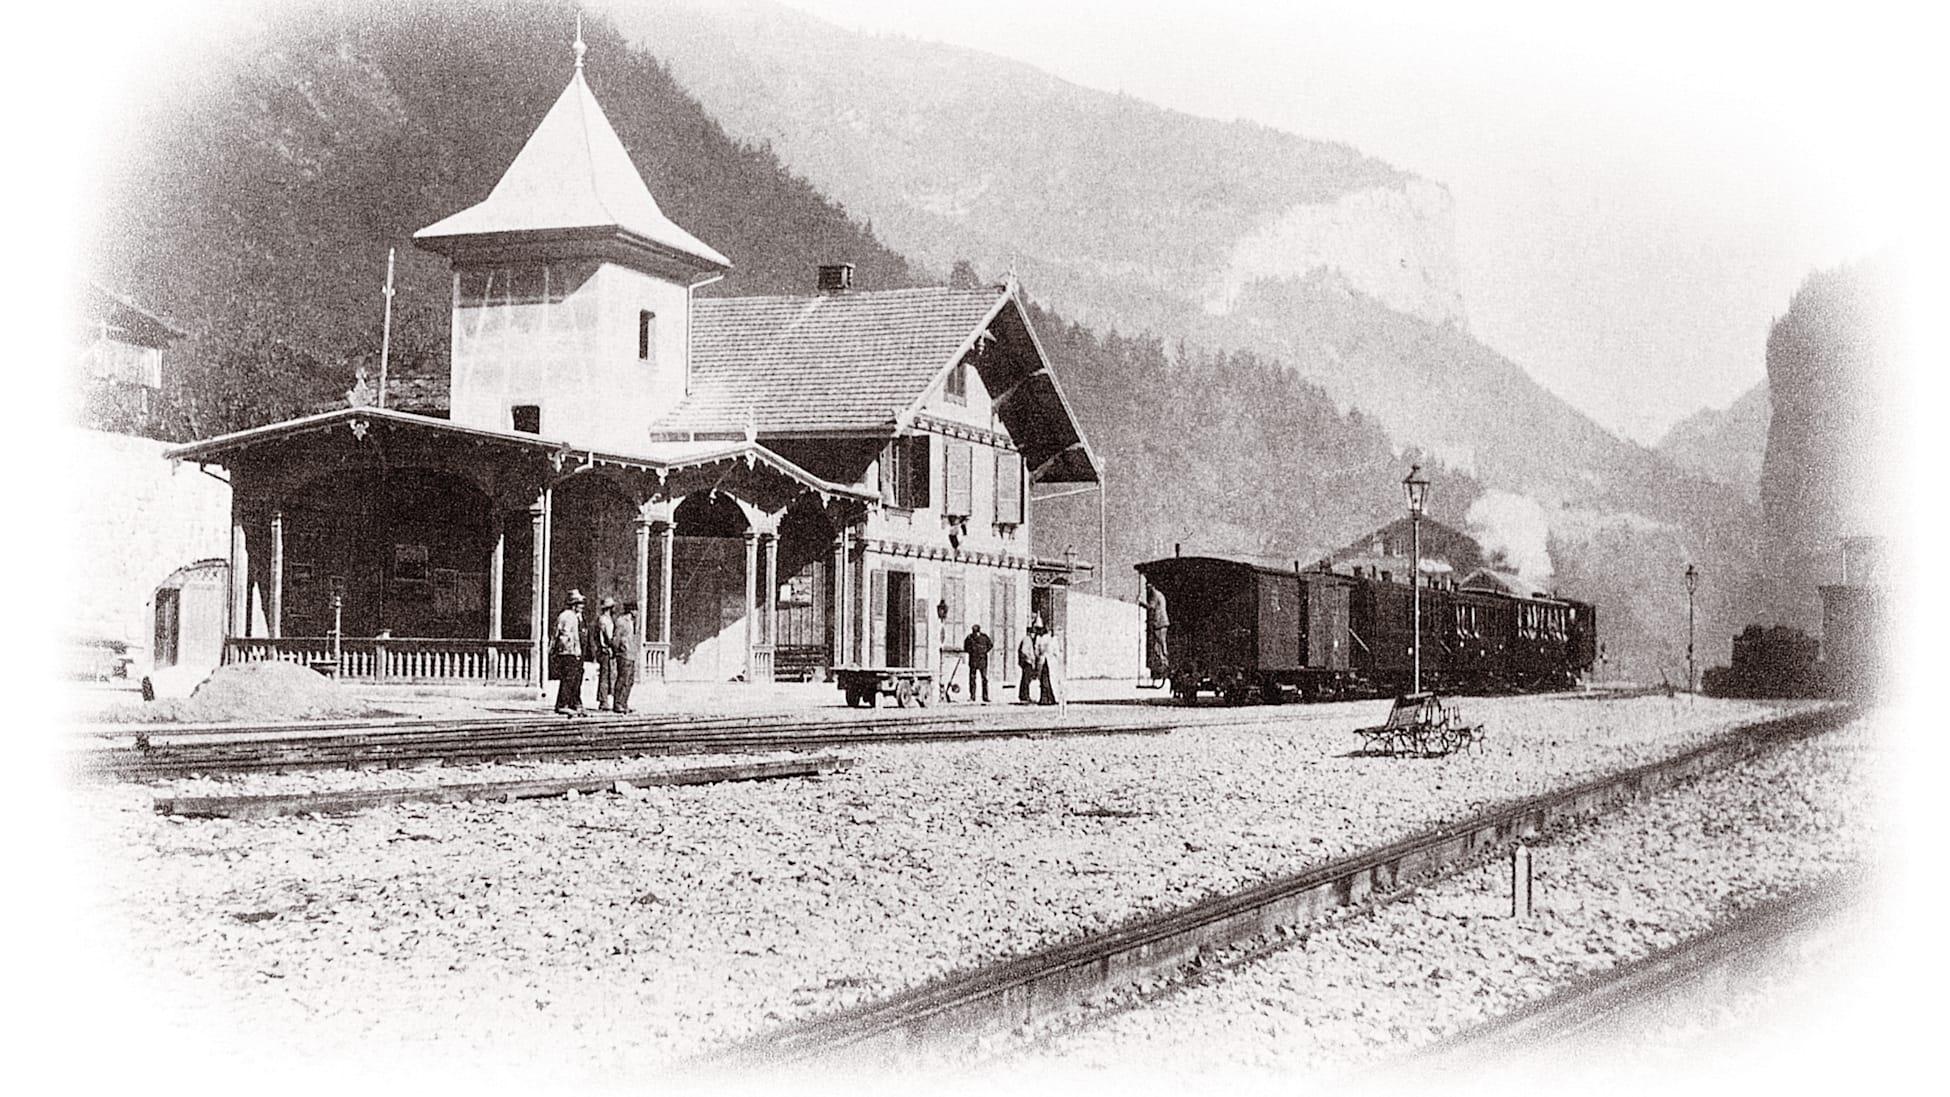 Jungfrau bob nostalgie 1005 lauterbrunnen 1895